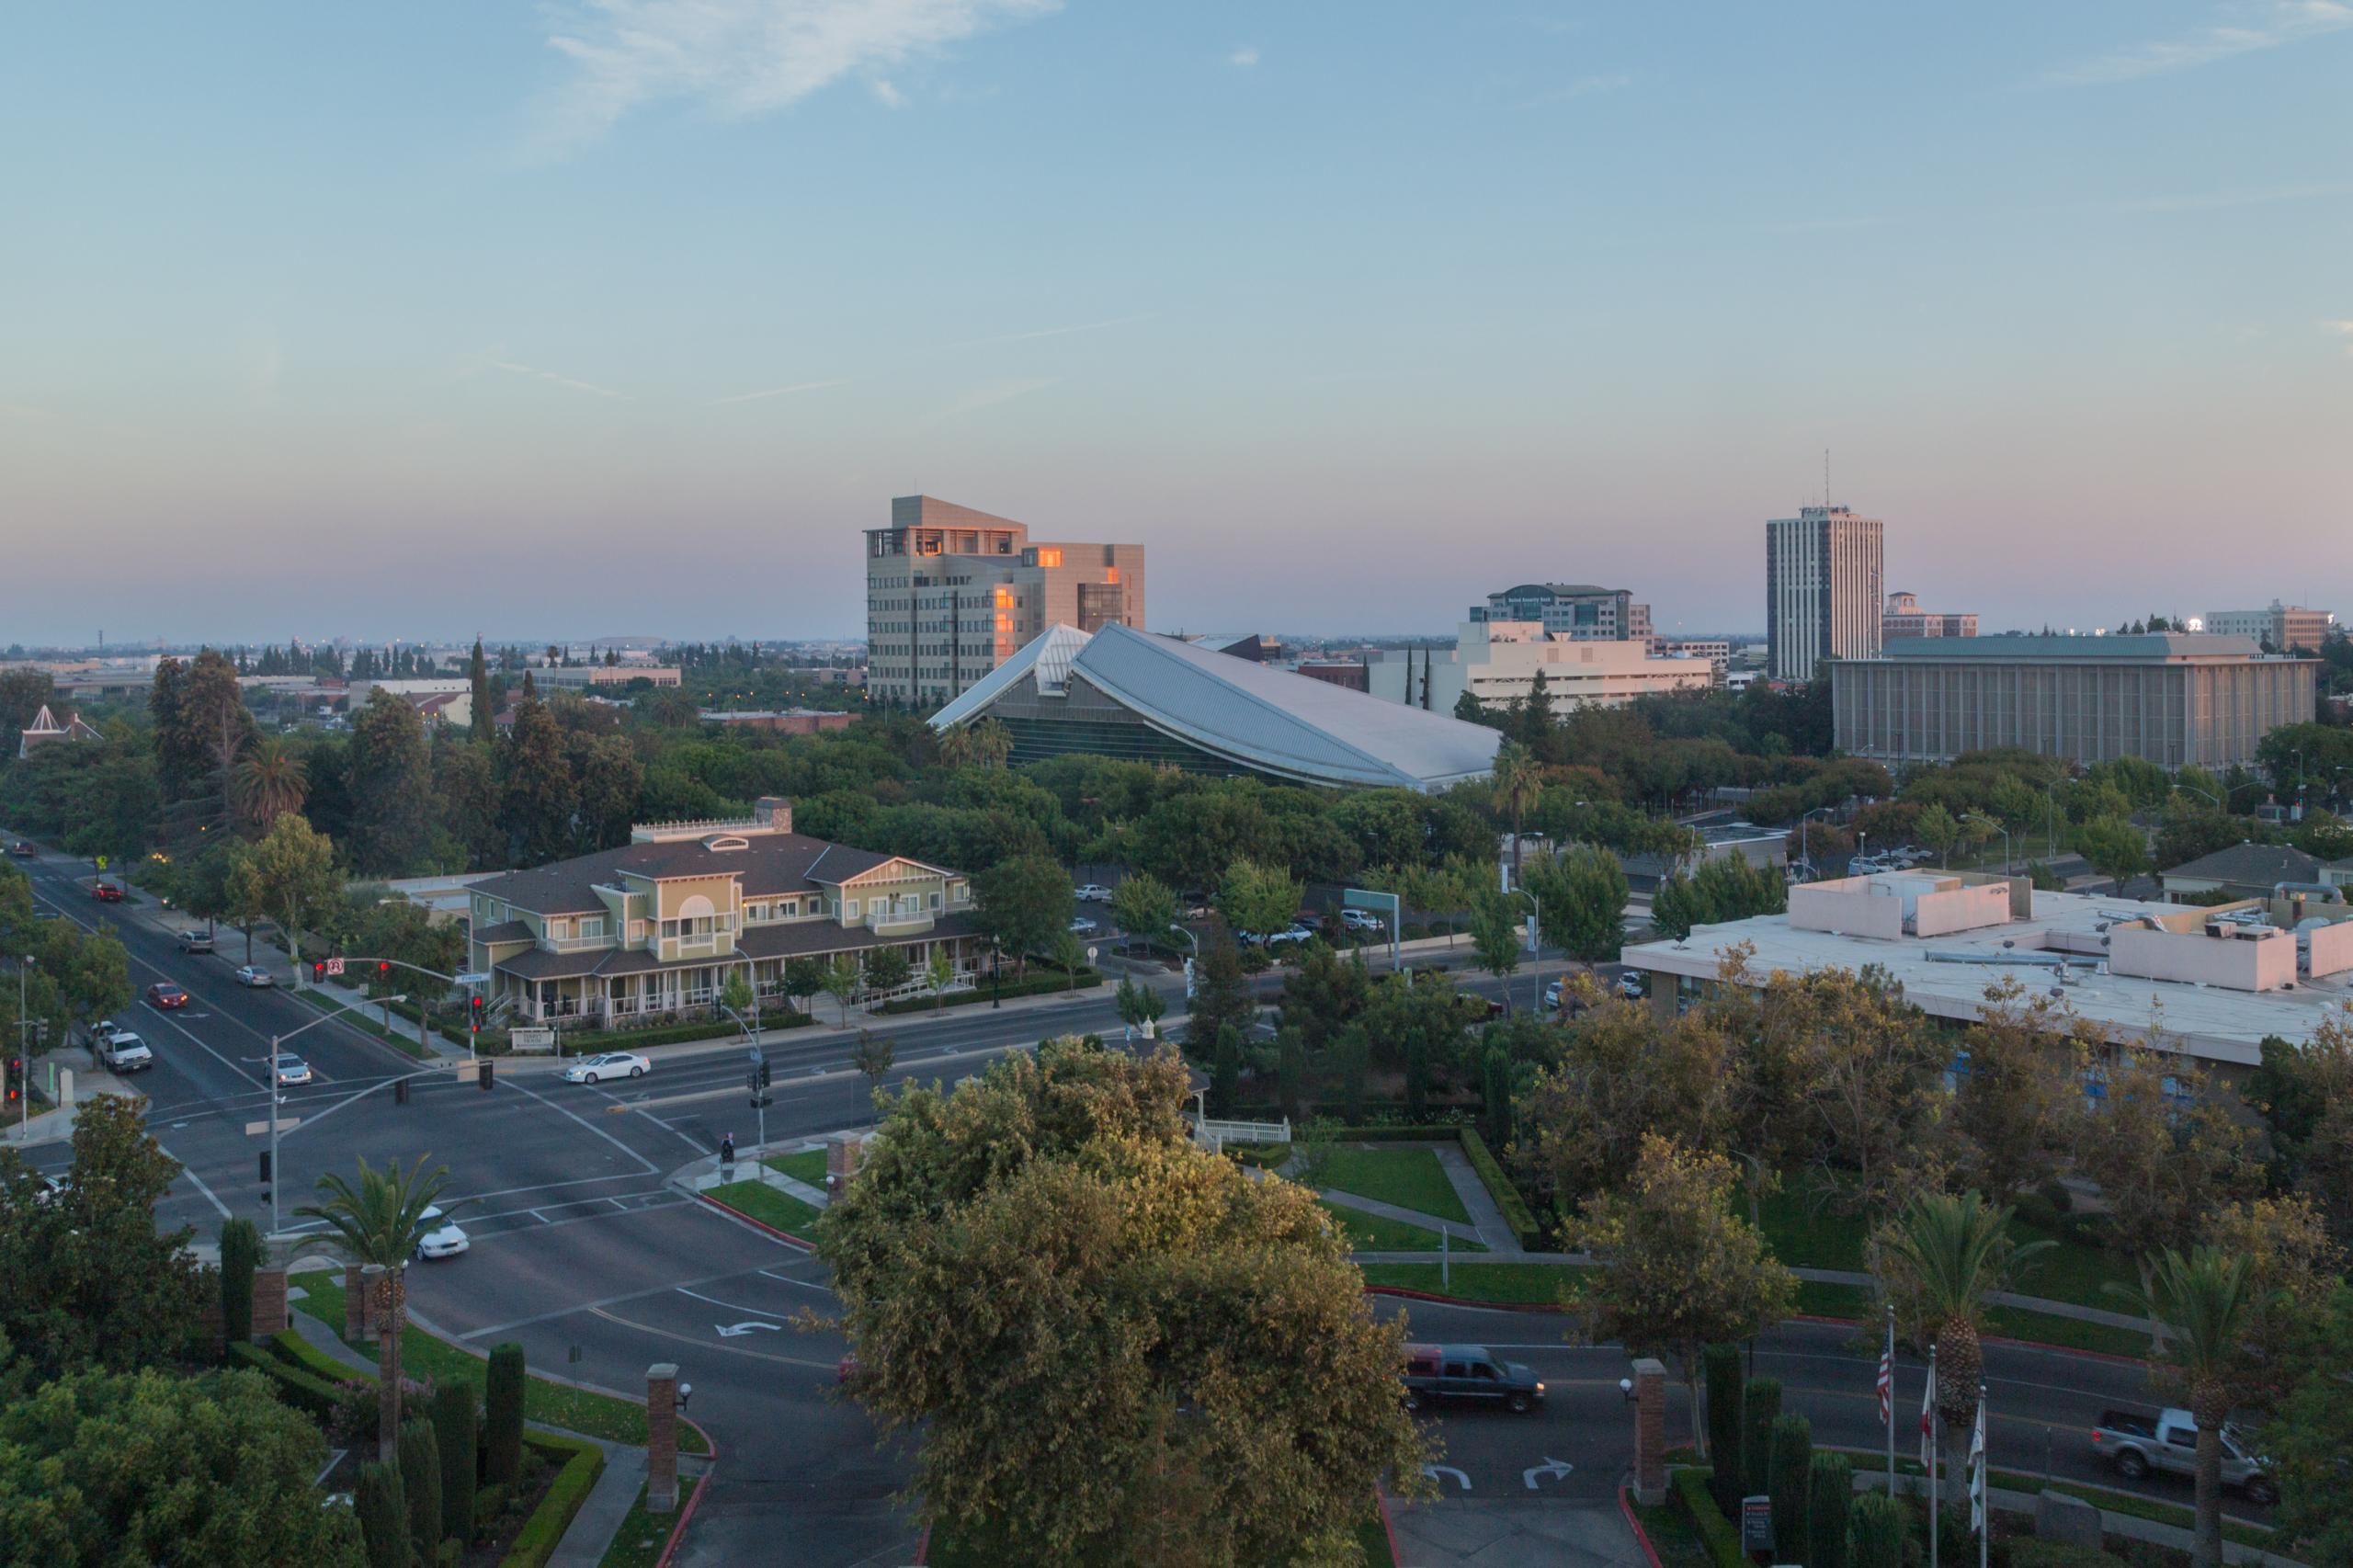 Aerial photo of Fresno City Hall in Fresno, California.